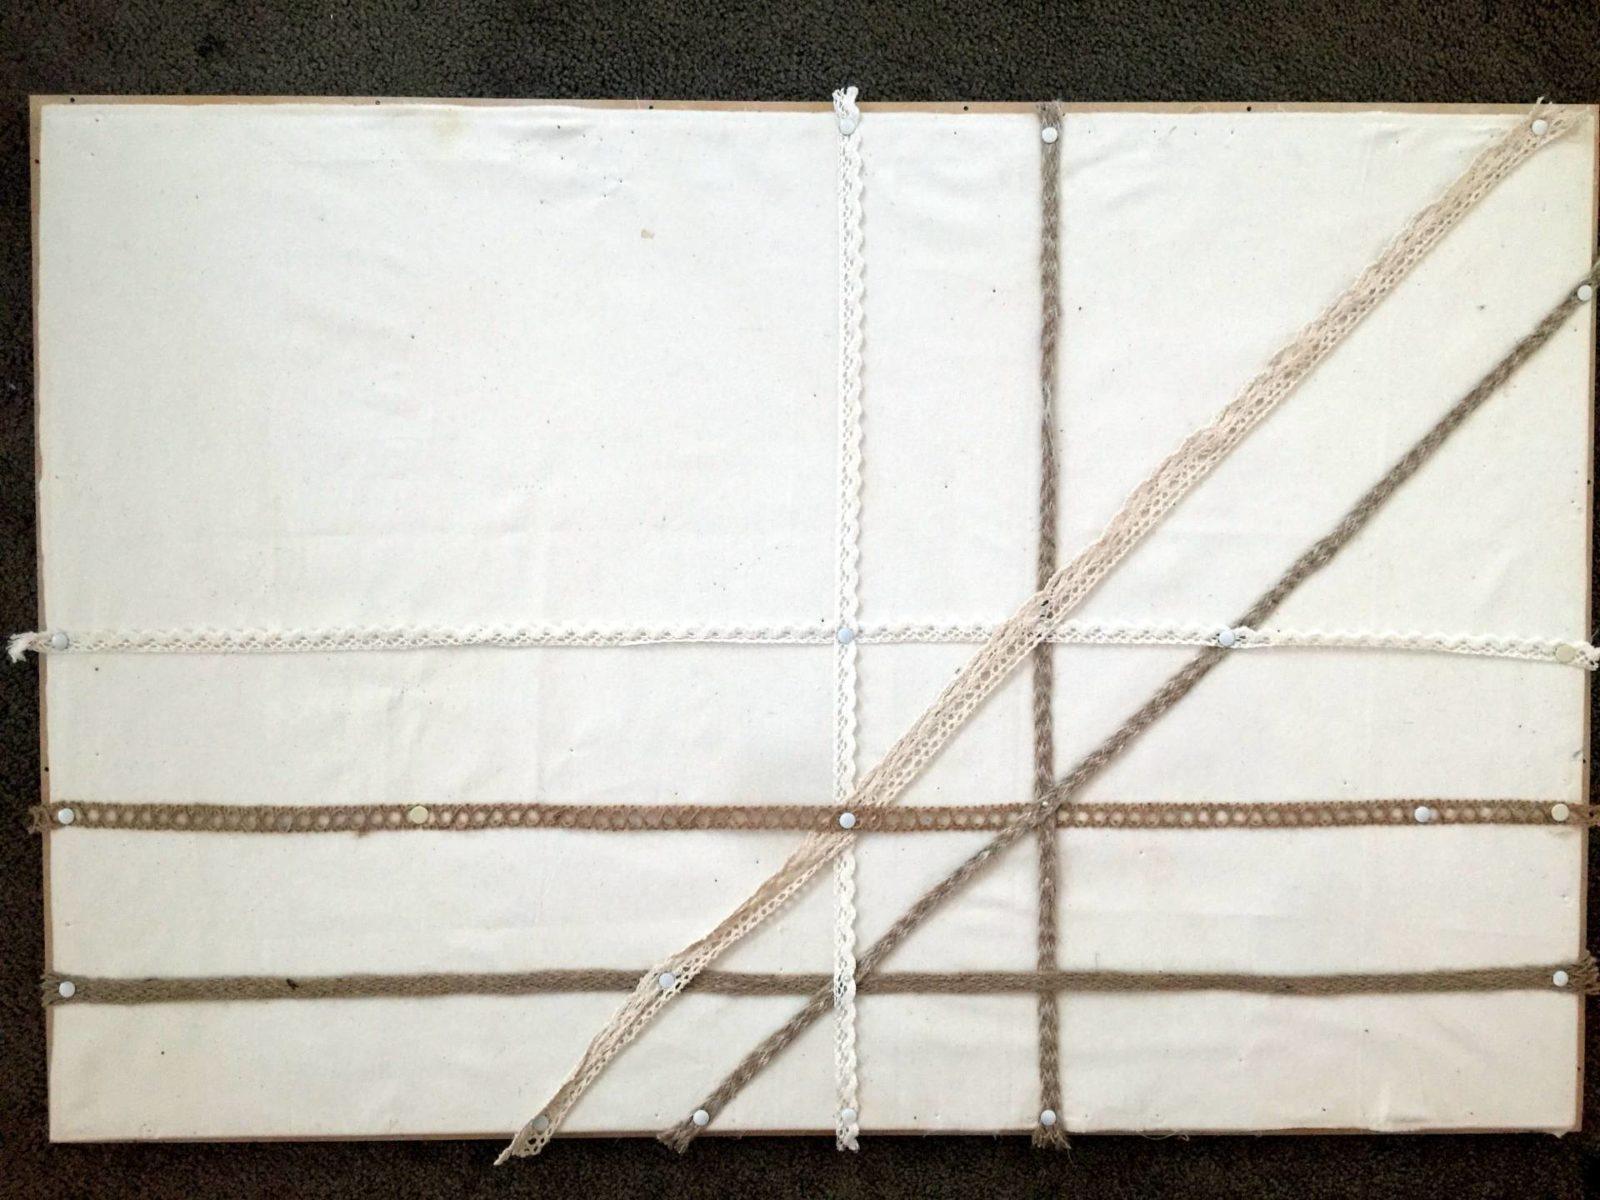 3 14 bulletin board-3